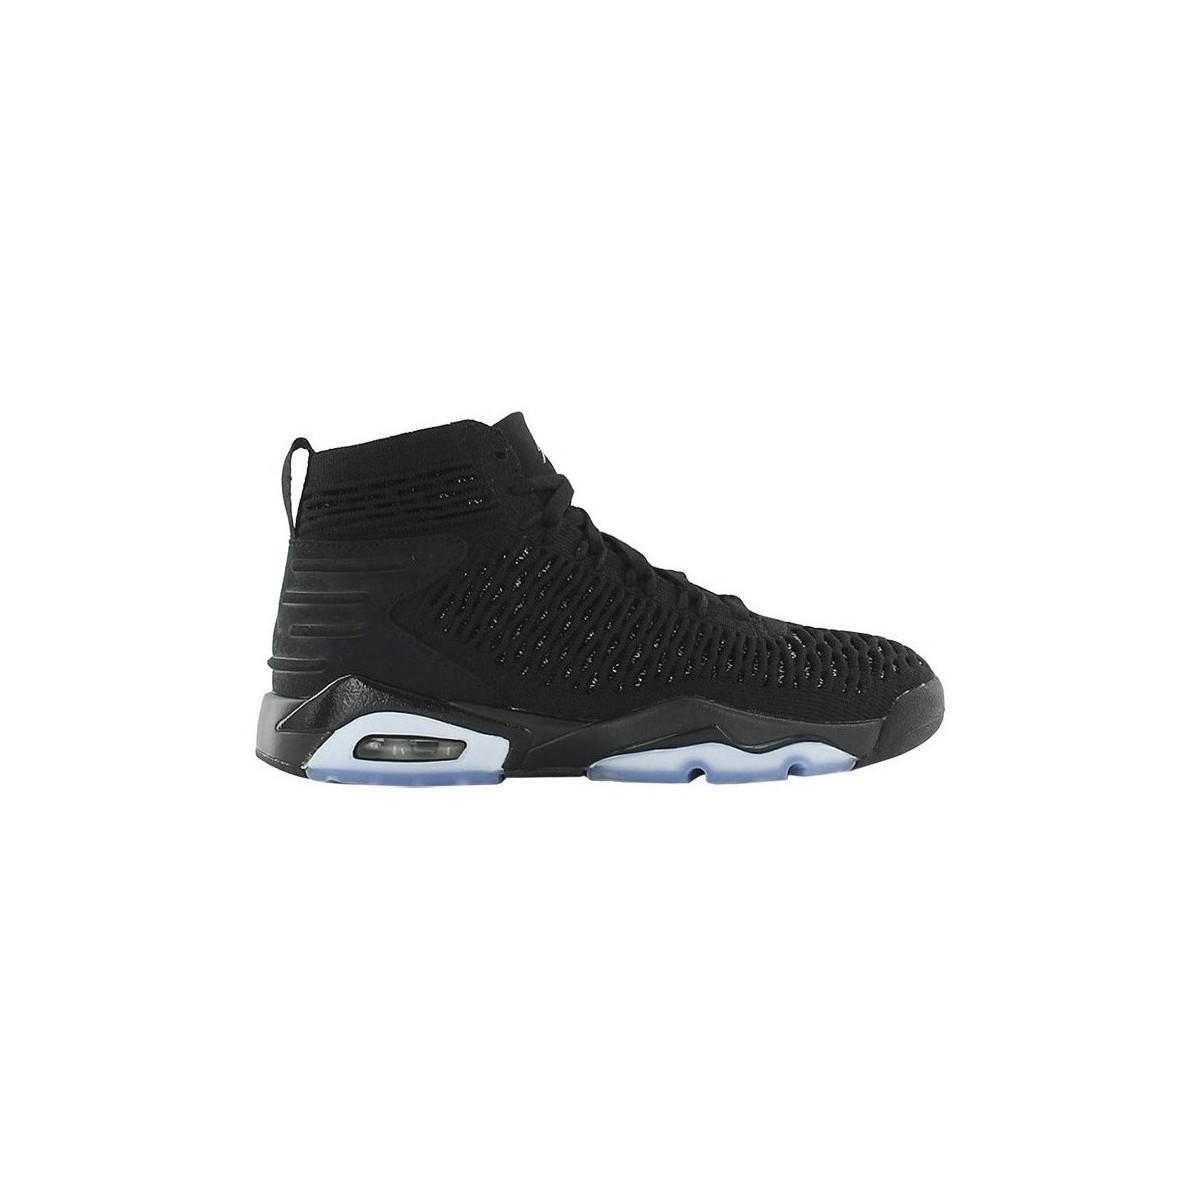 hot sale online c3a65 c550b Lyst - Jordan Flyknit Elevation 23 hommes Chaussures en Noir Nike ...